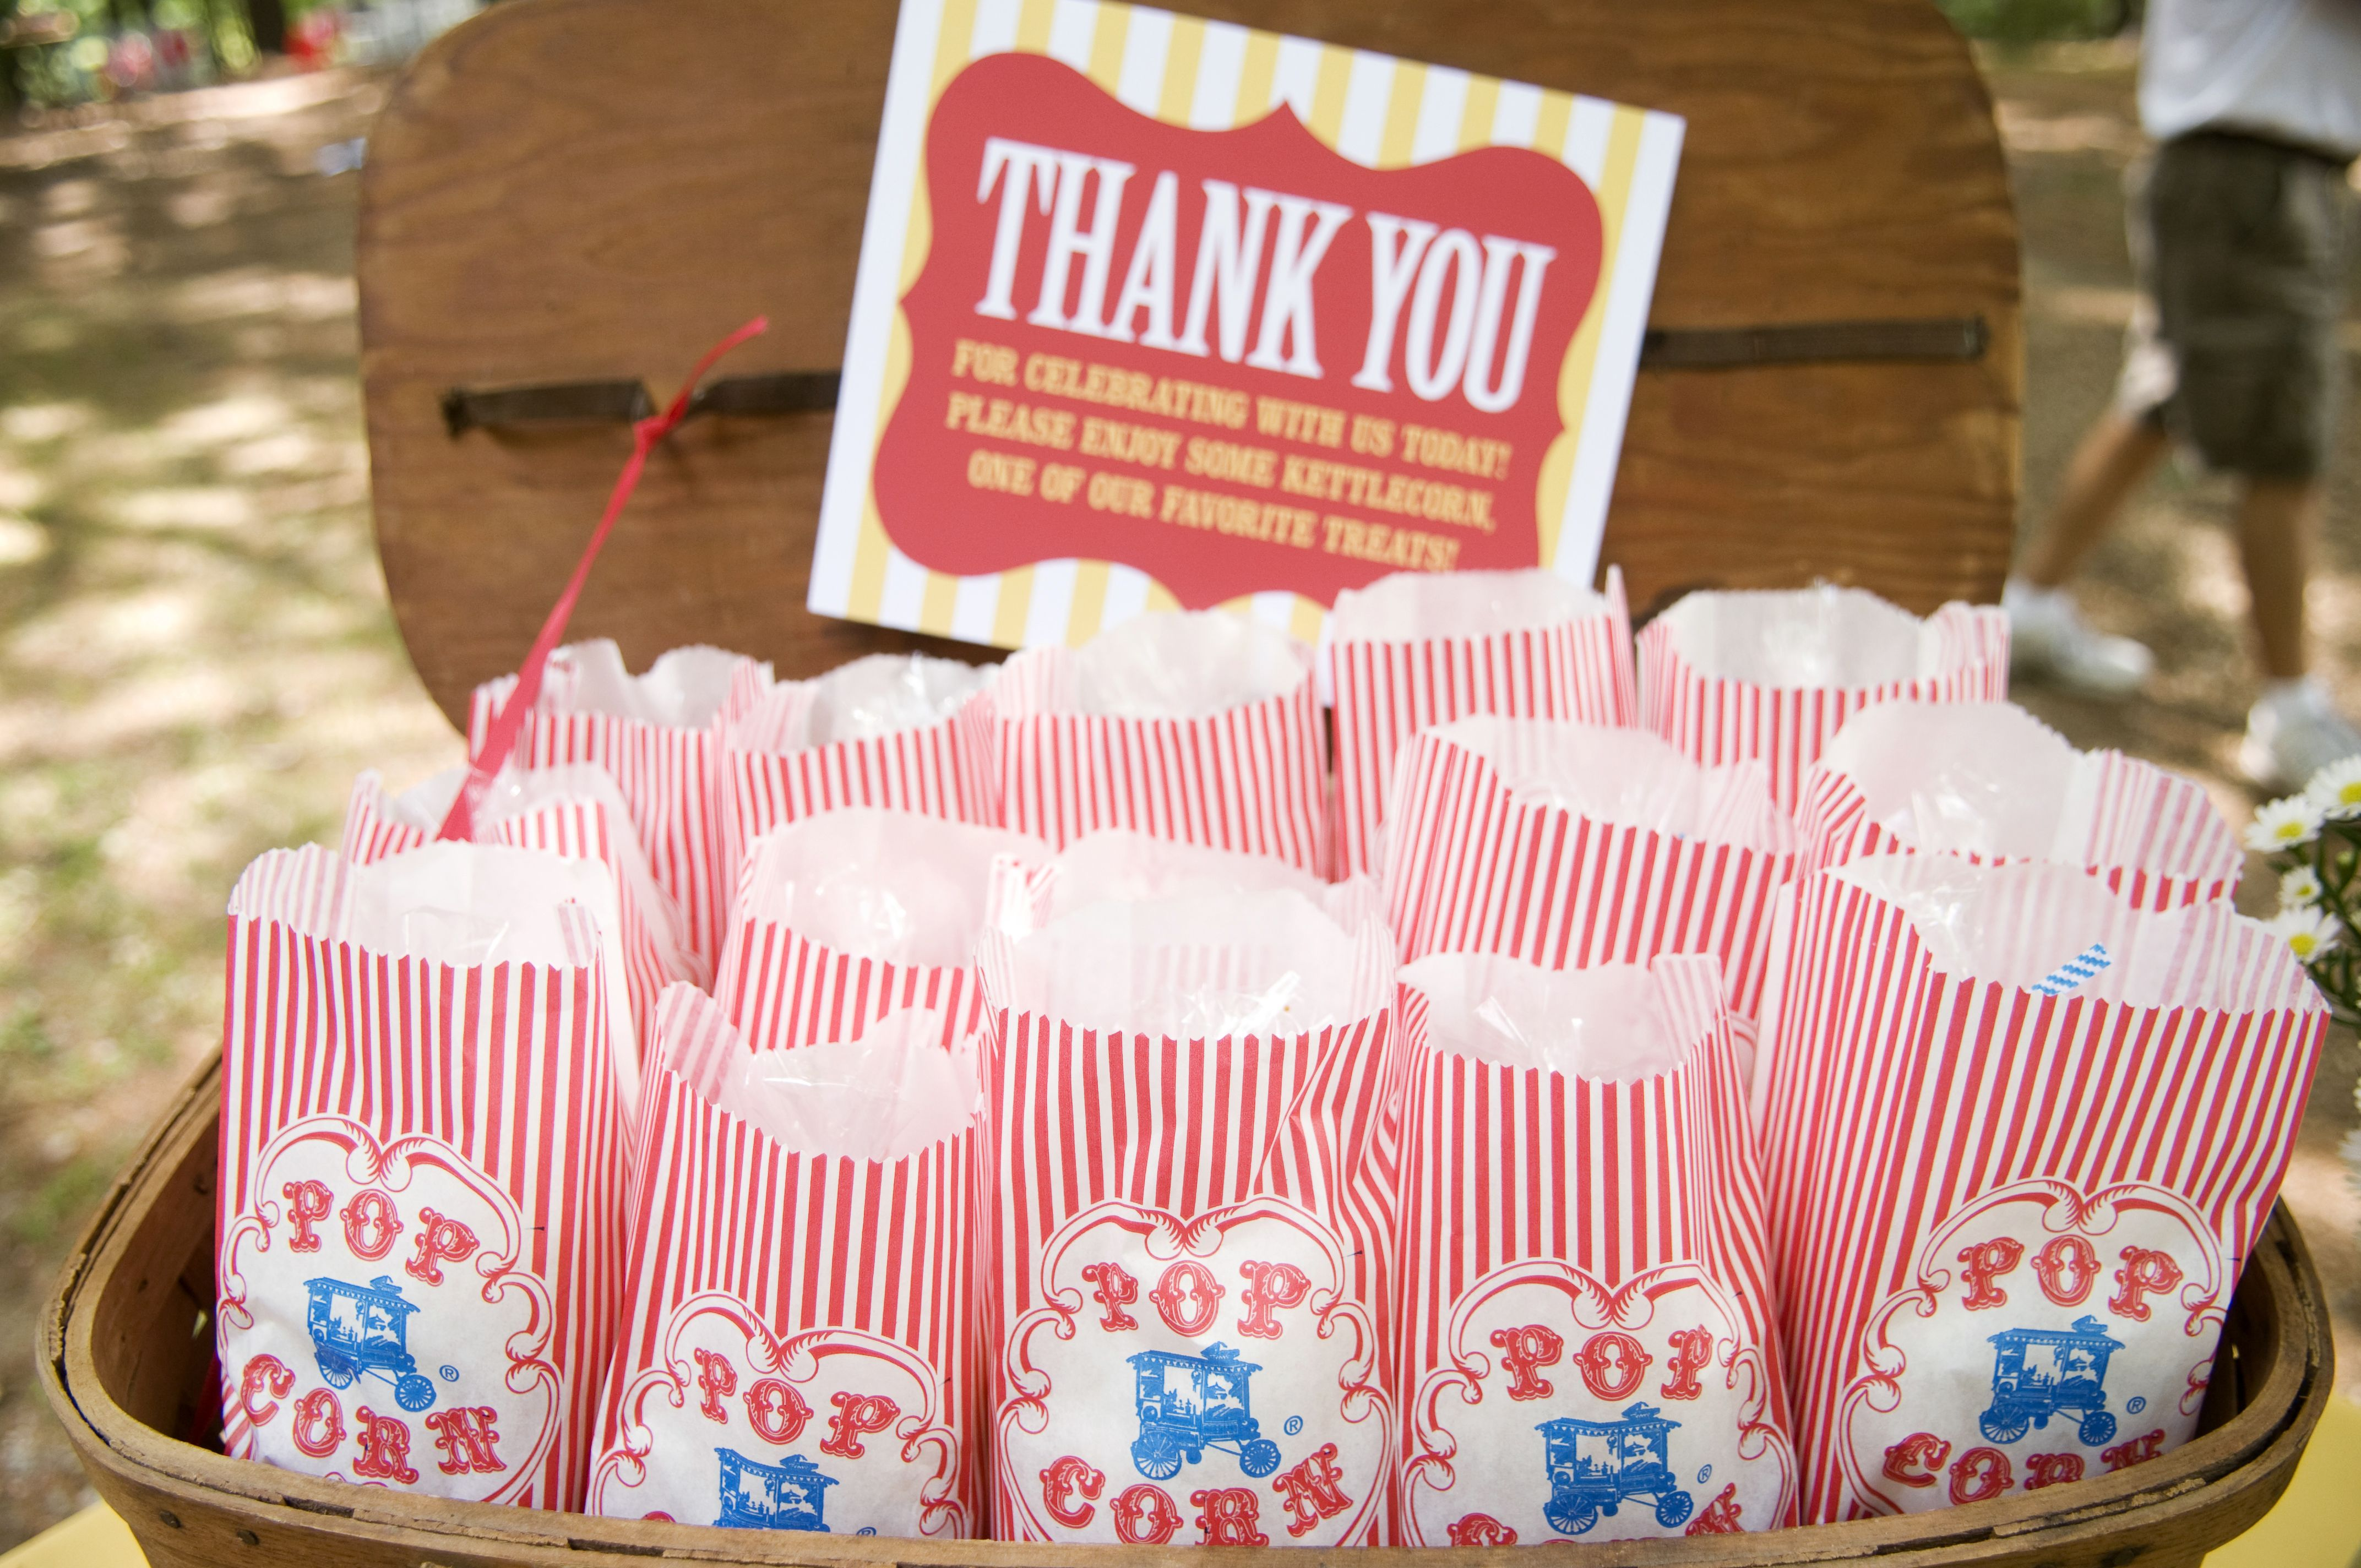 Popcorn bar27 | Popcorn Bar Images | Pinterest | Popcorn bar